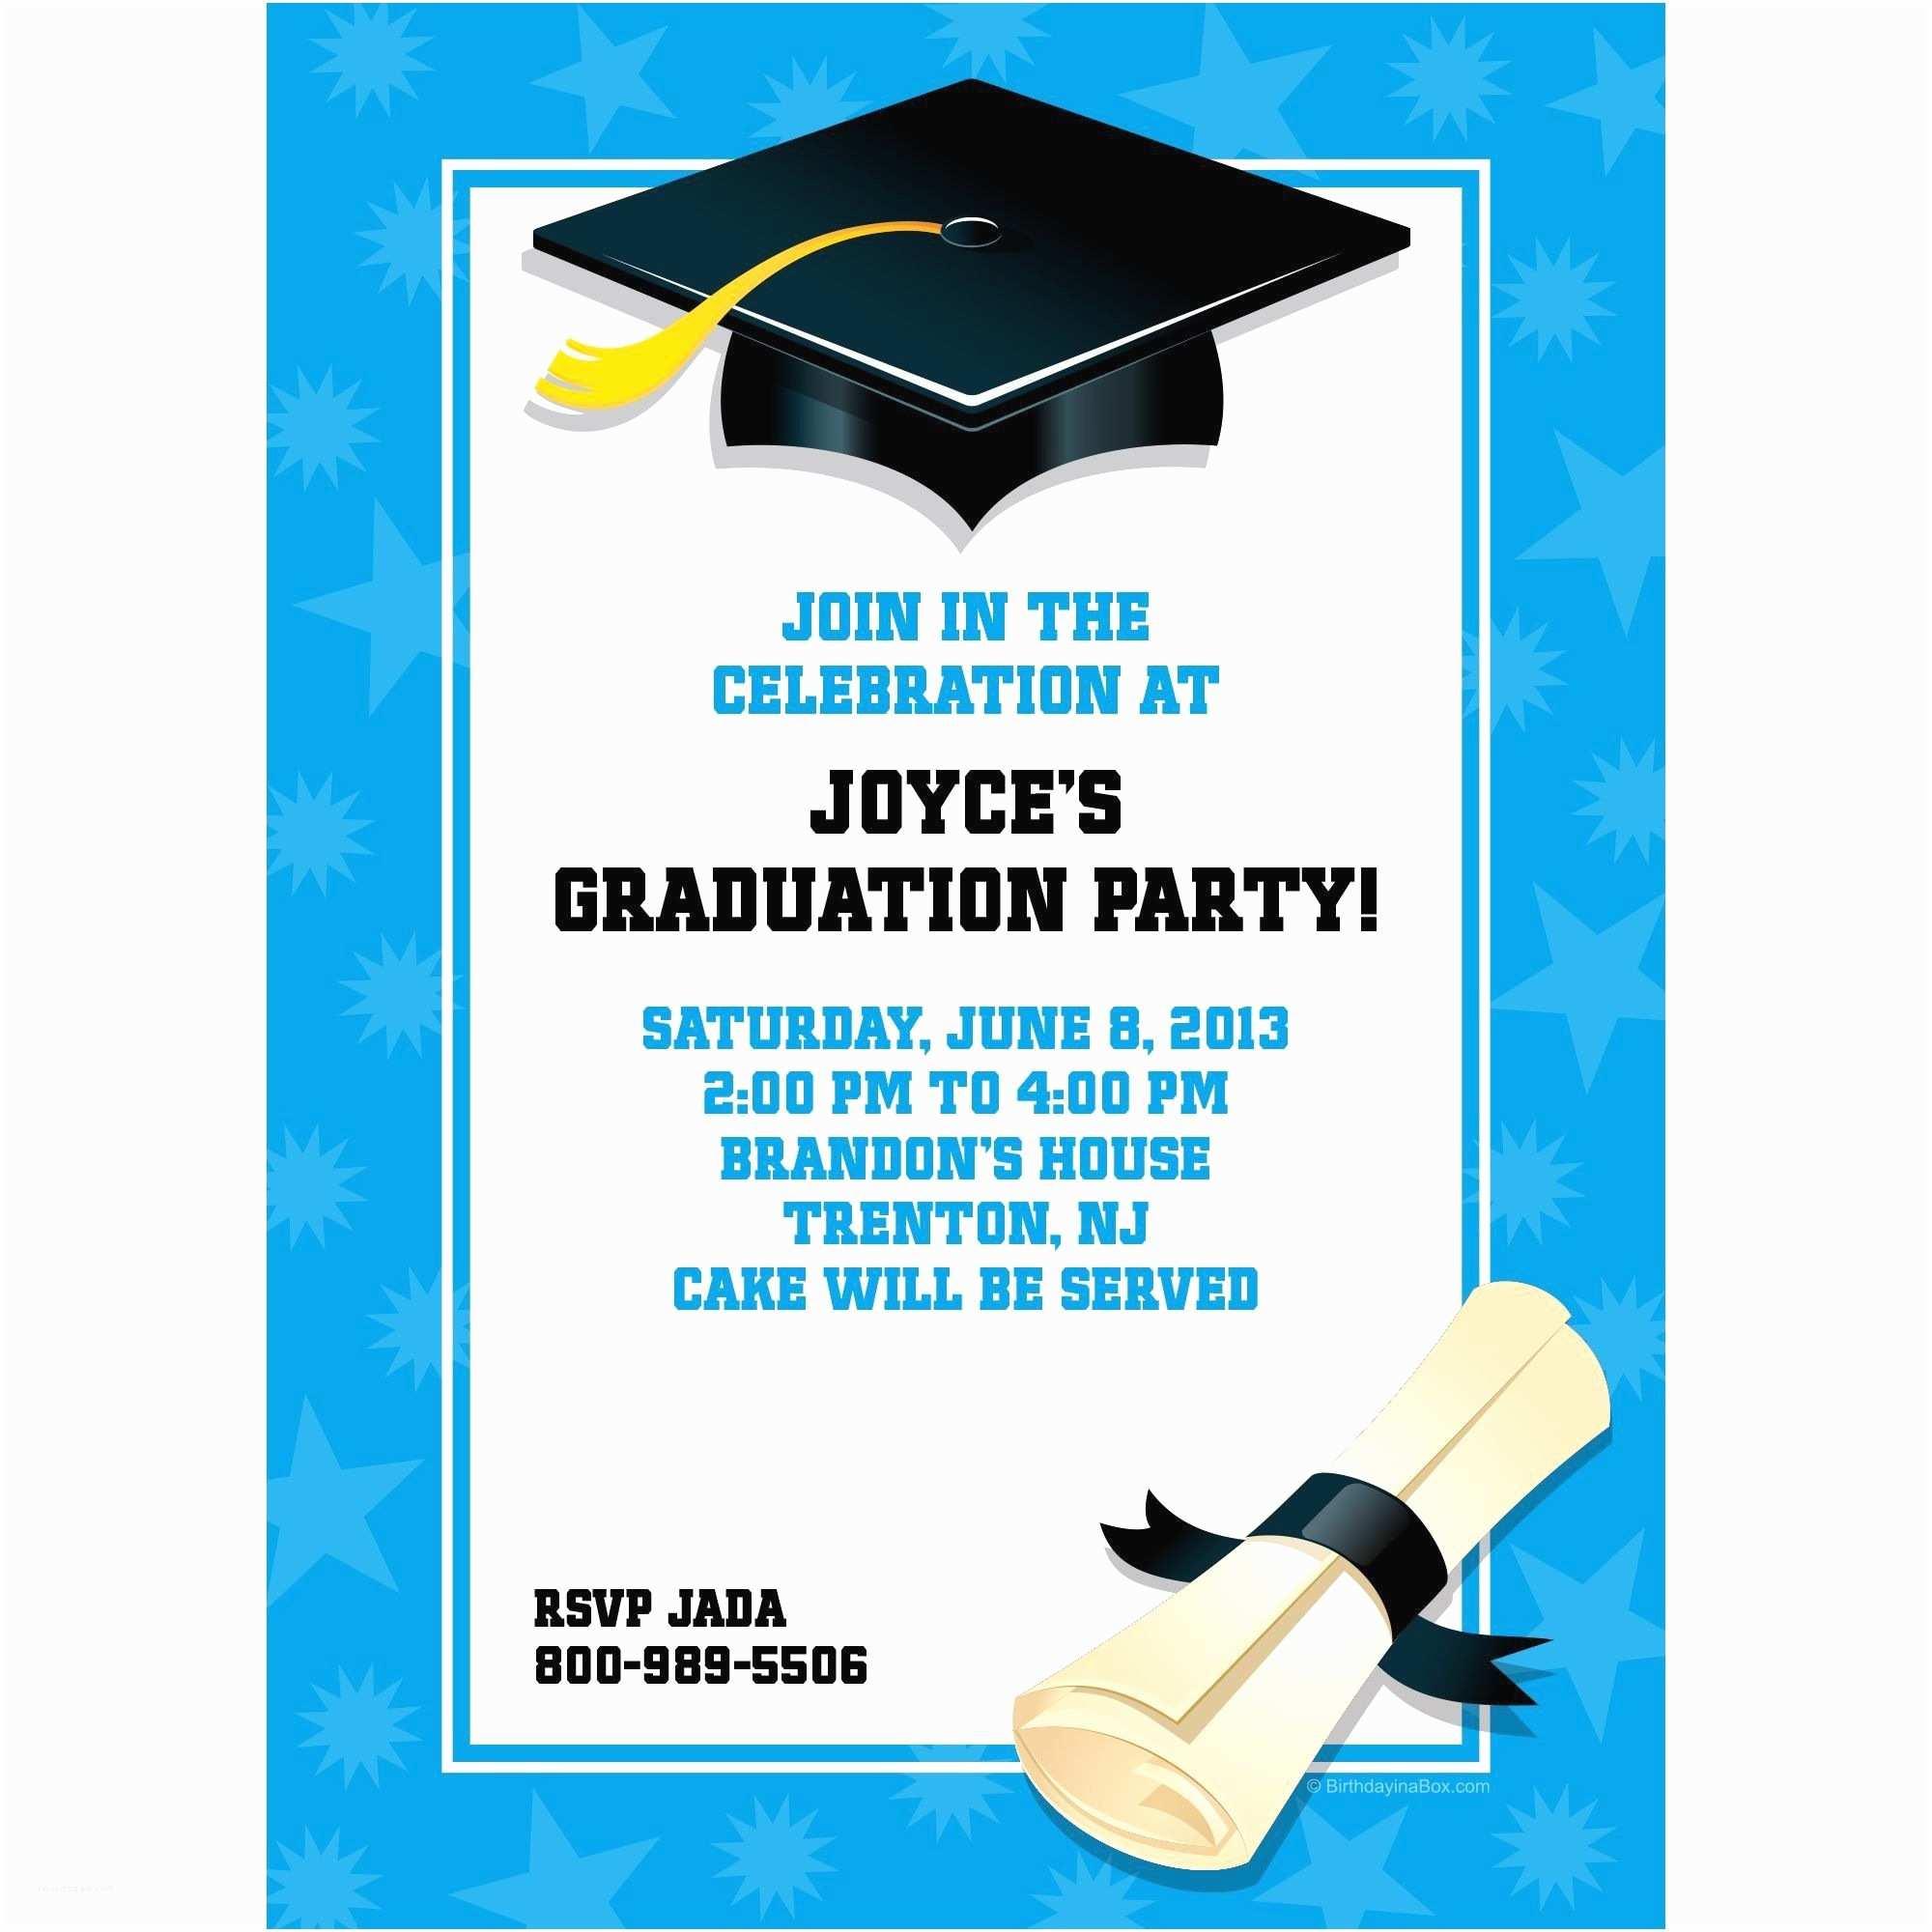 Cheap Graduation Party Invitations Bright Blue Graduation Personalized Invitation Each